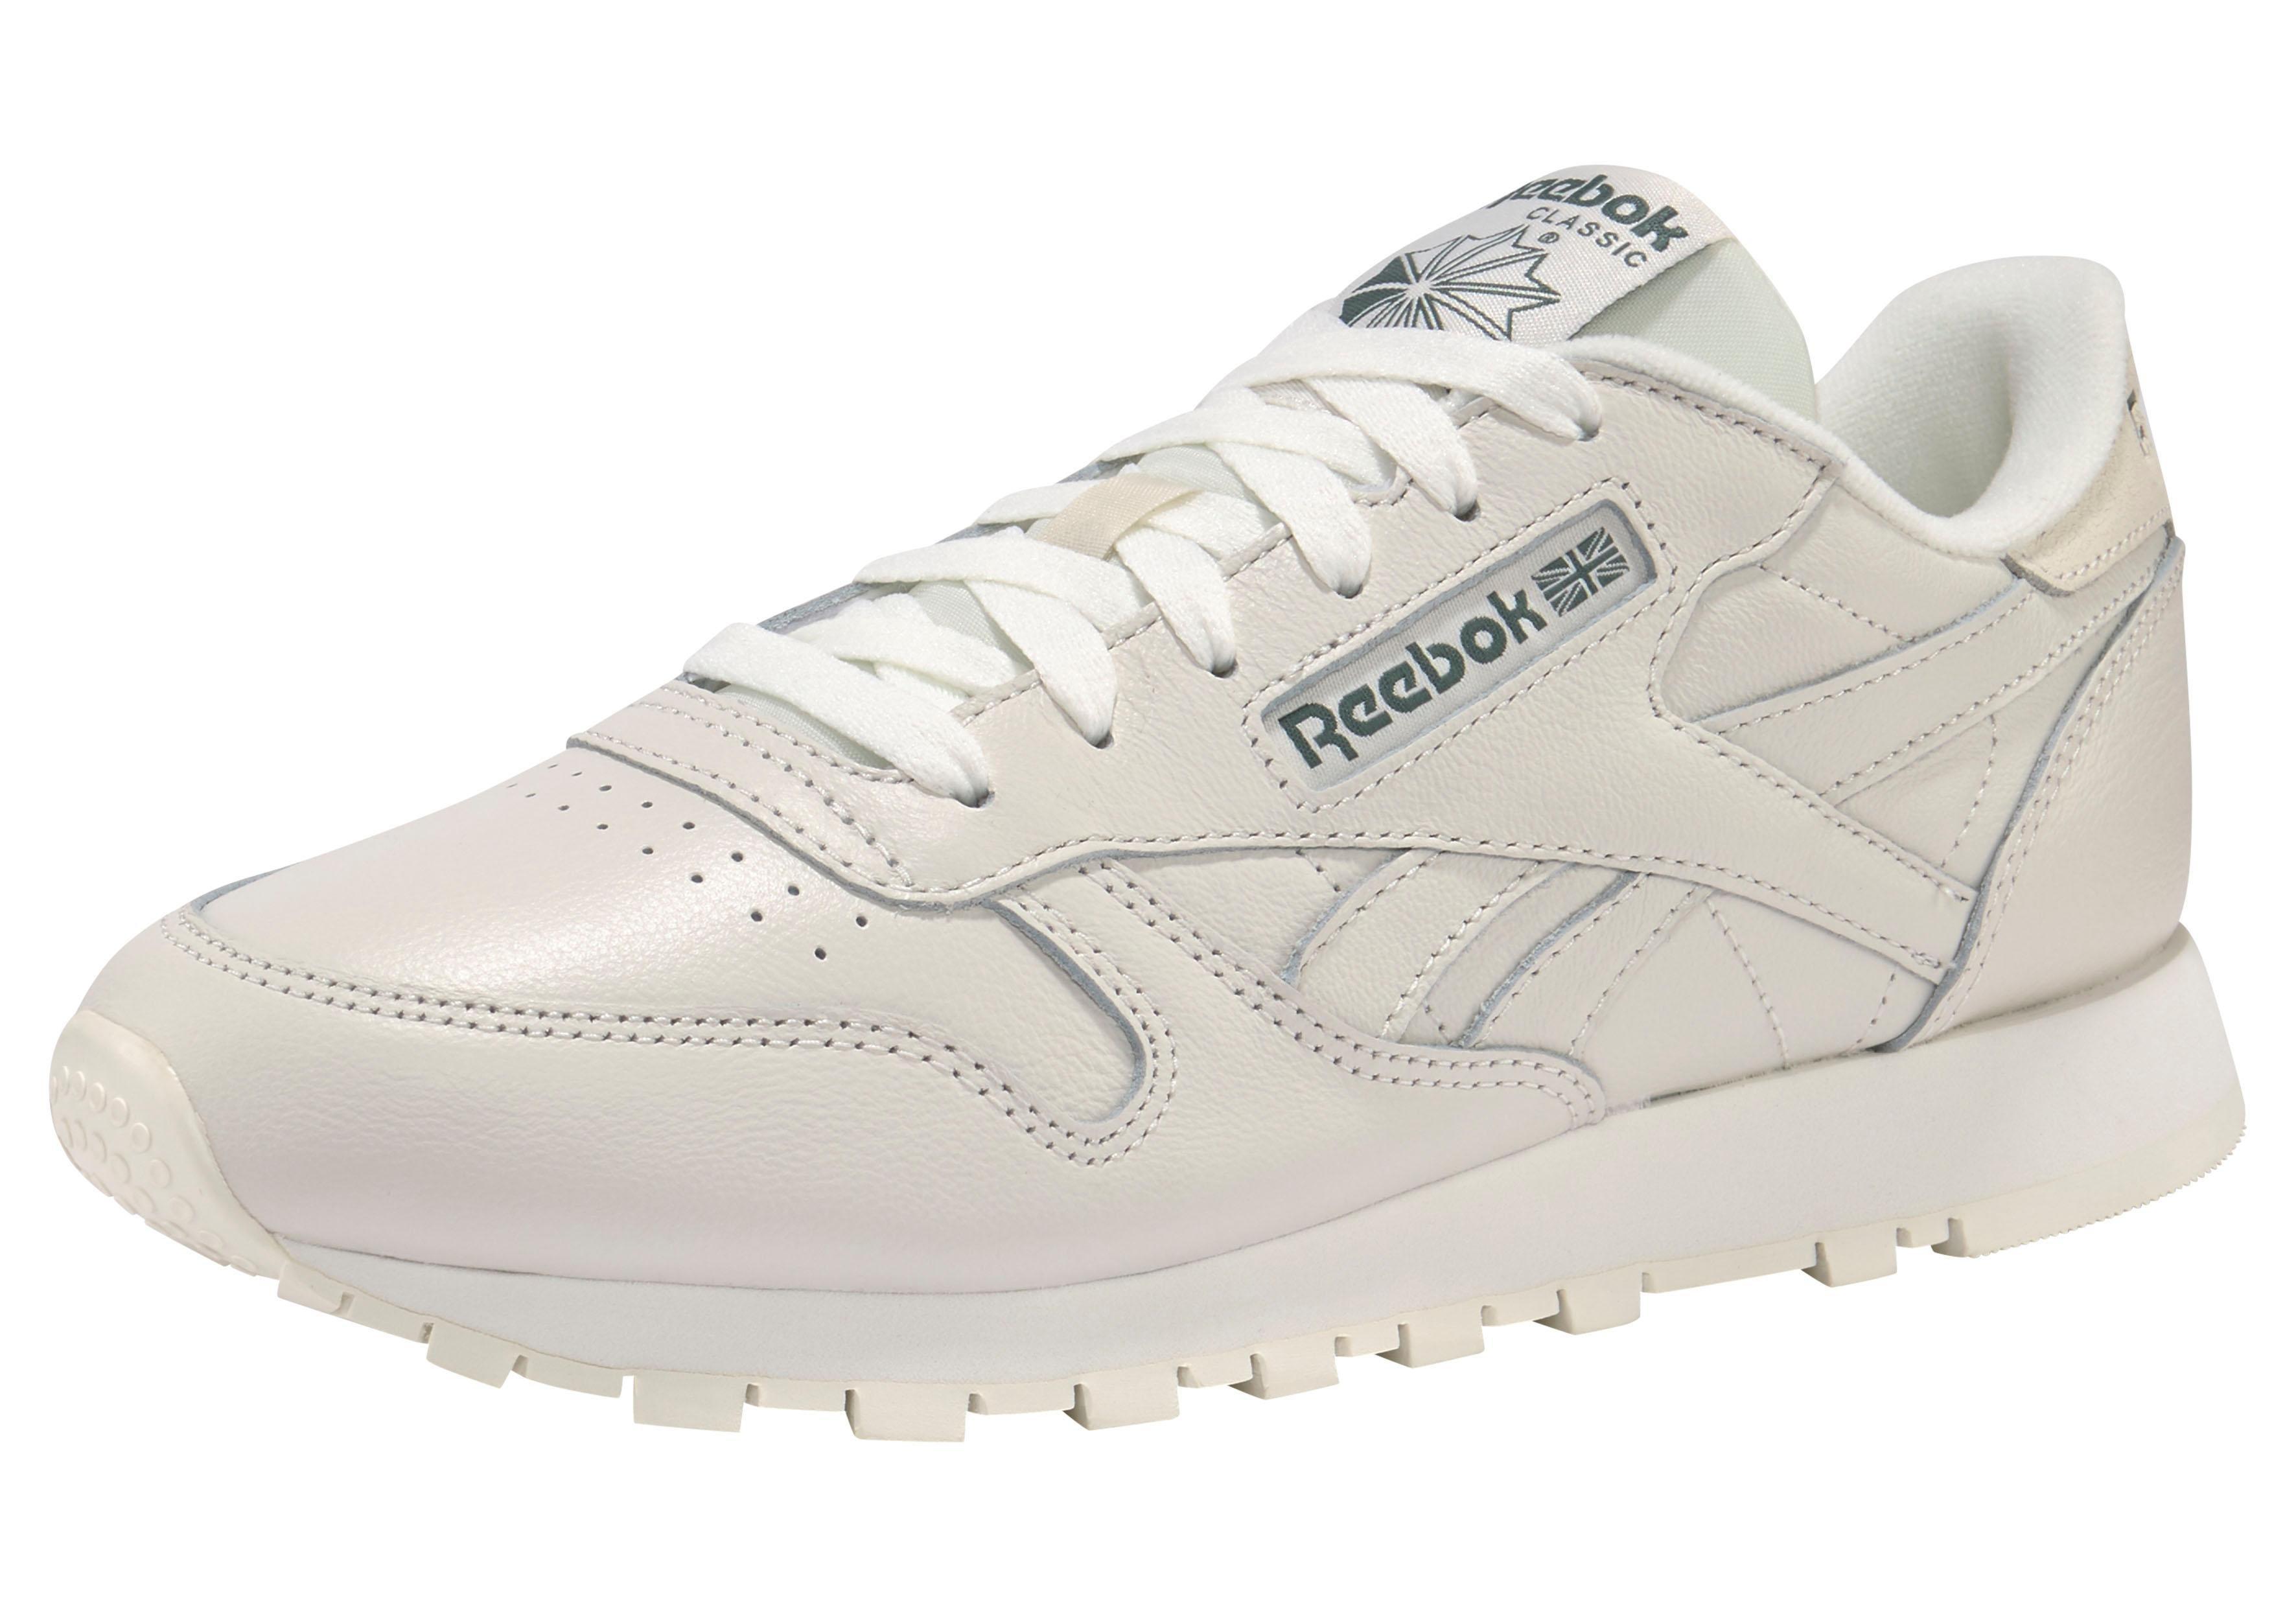 ebf30c5099c66 Reebok Classic Tenisky »Classic Leather Trend« vlnená biela-zelená ...